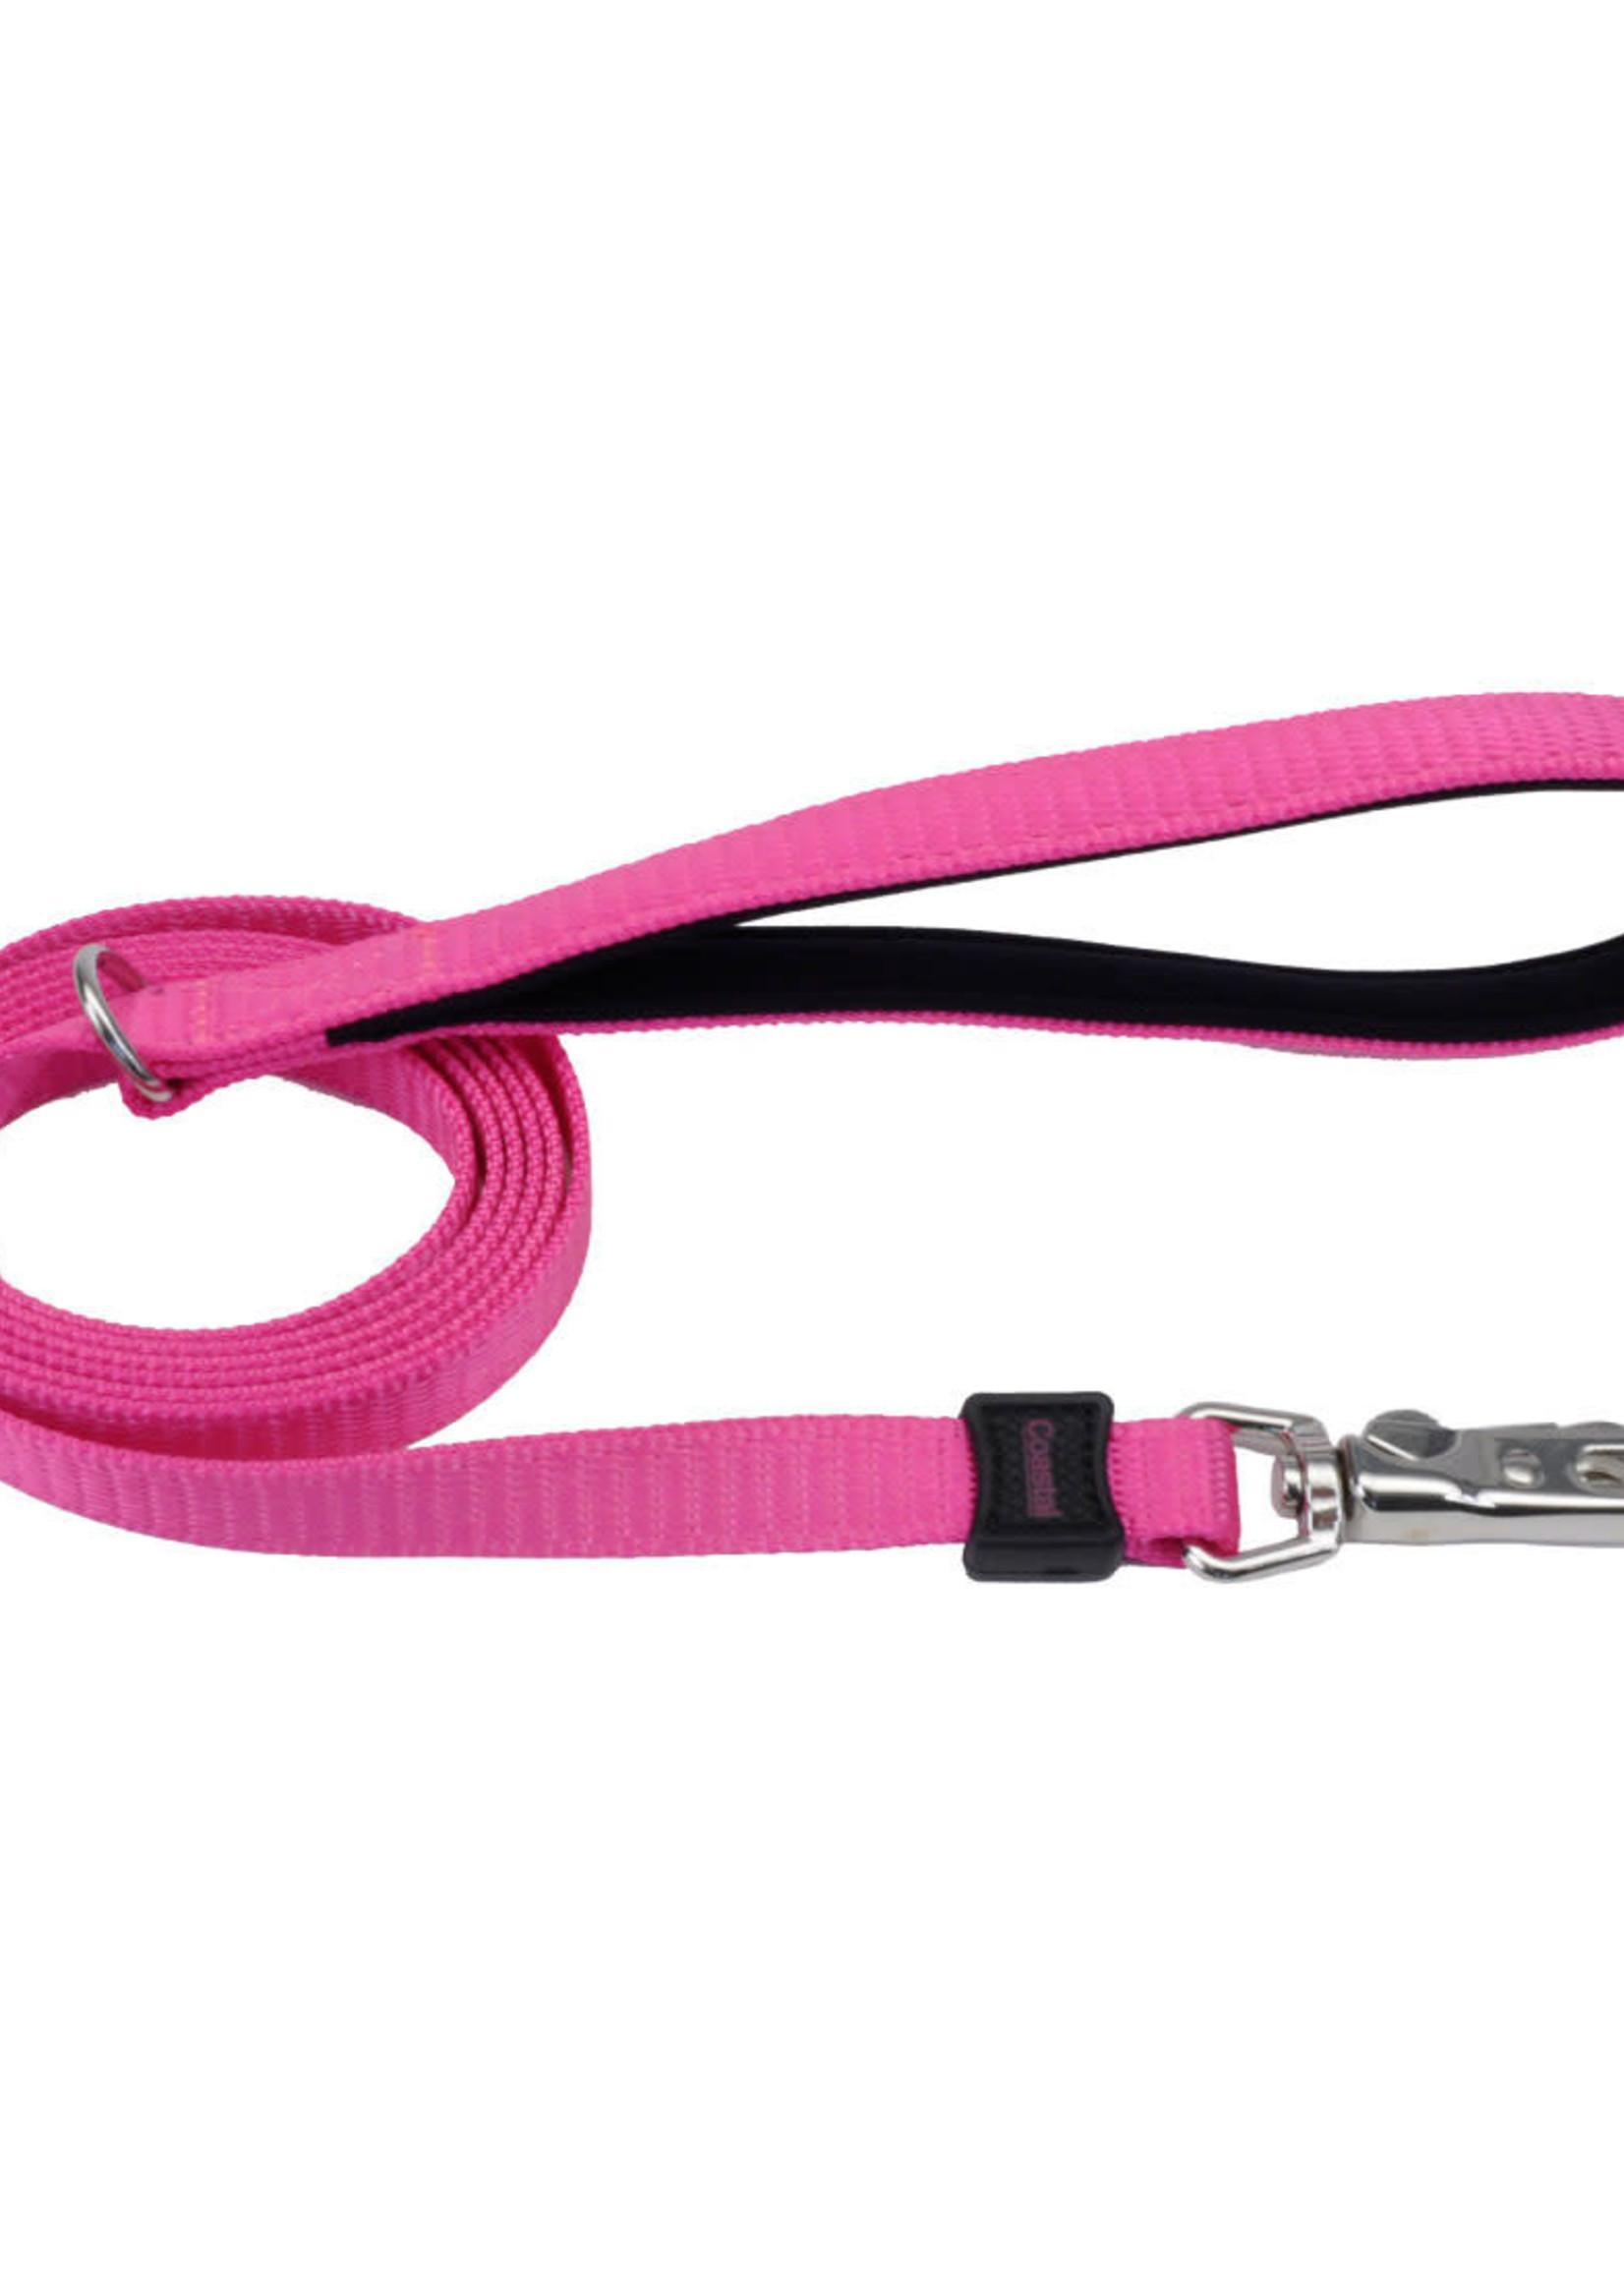 "Coastal® Inspire Neoprene Leash 5/8""x 6' Pink"